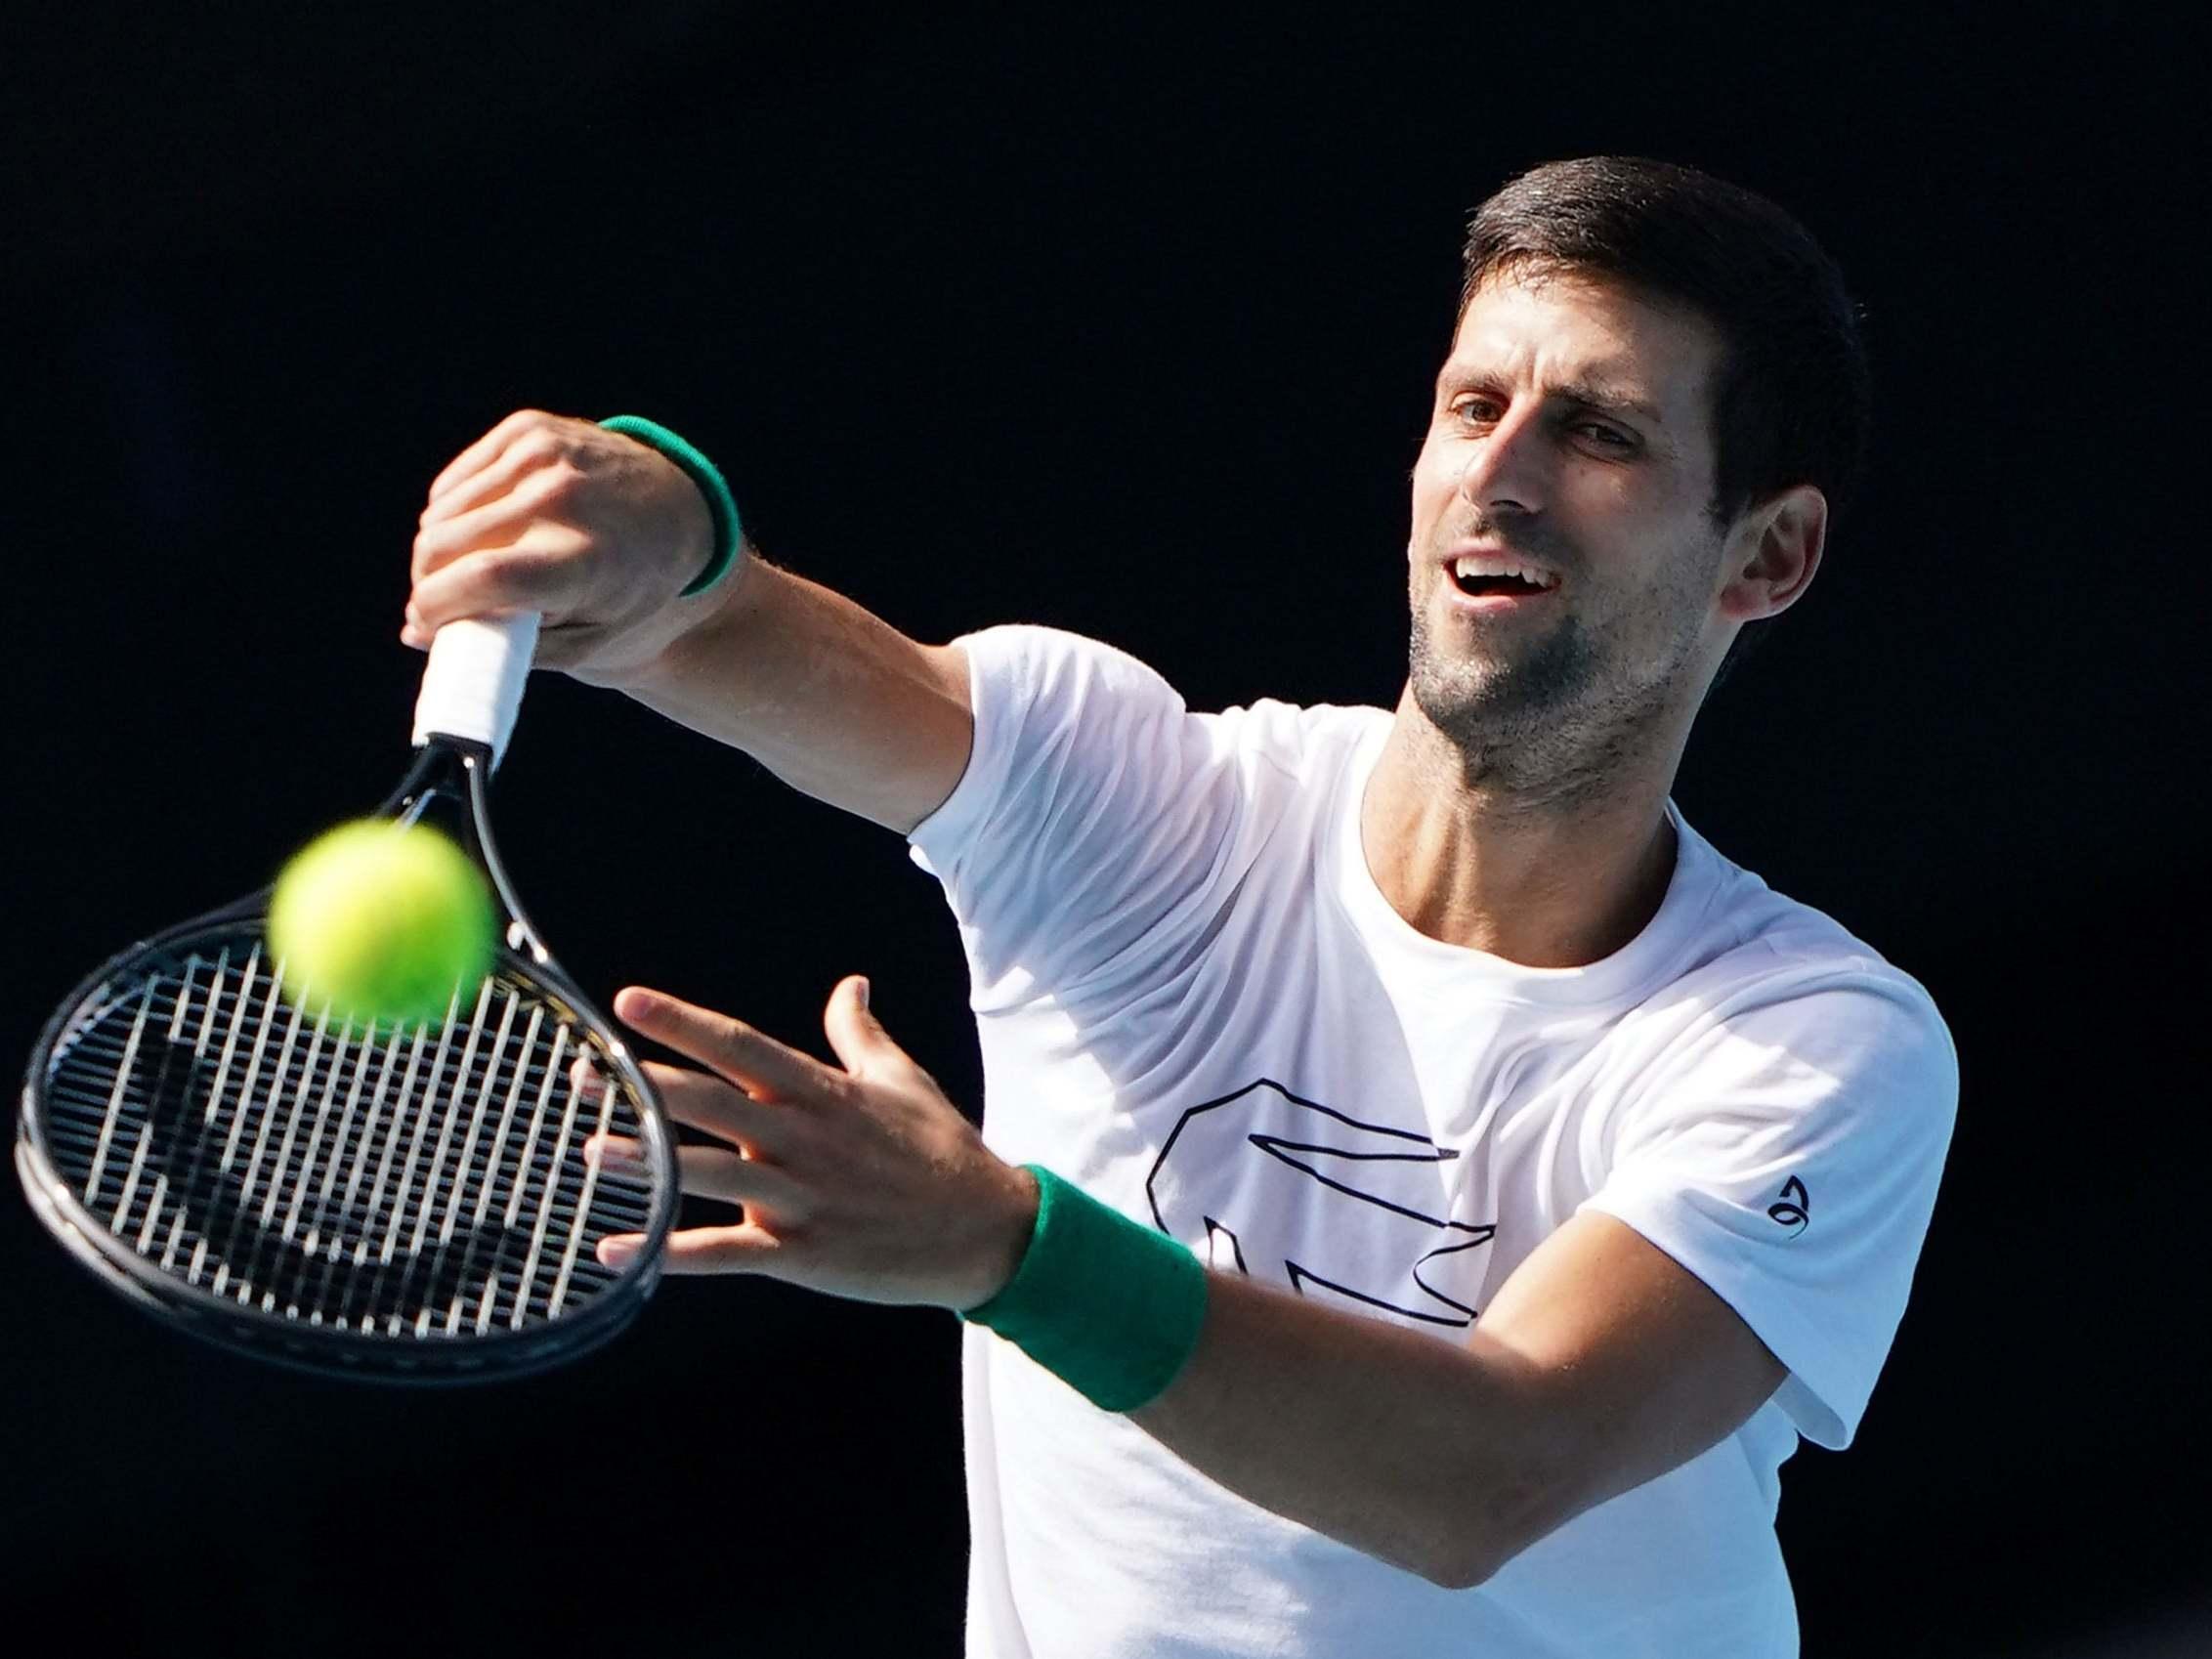 Australian Open 2020 Draw Novak Djokovic On Same Side Of